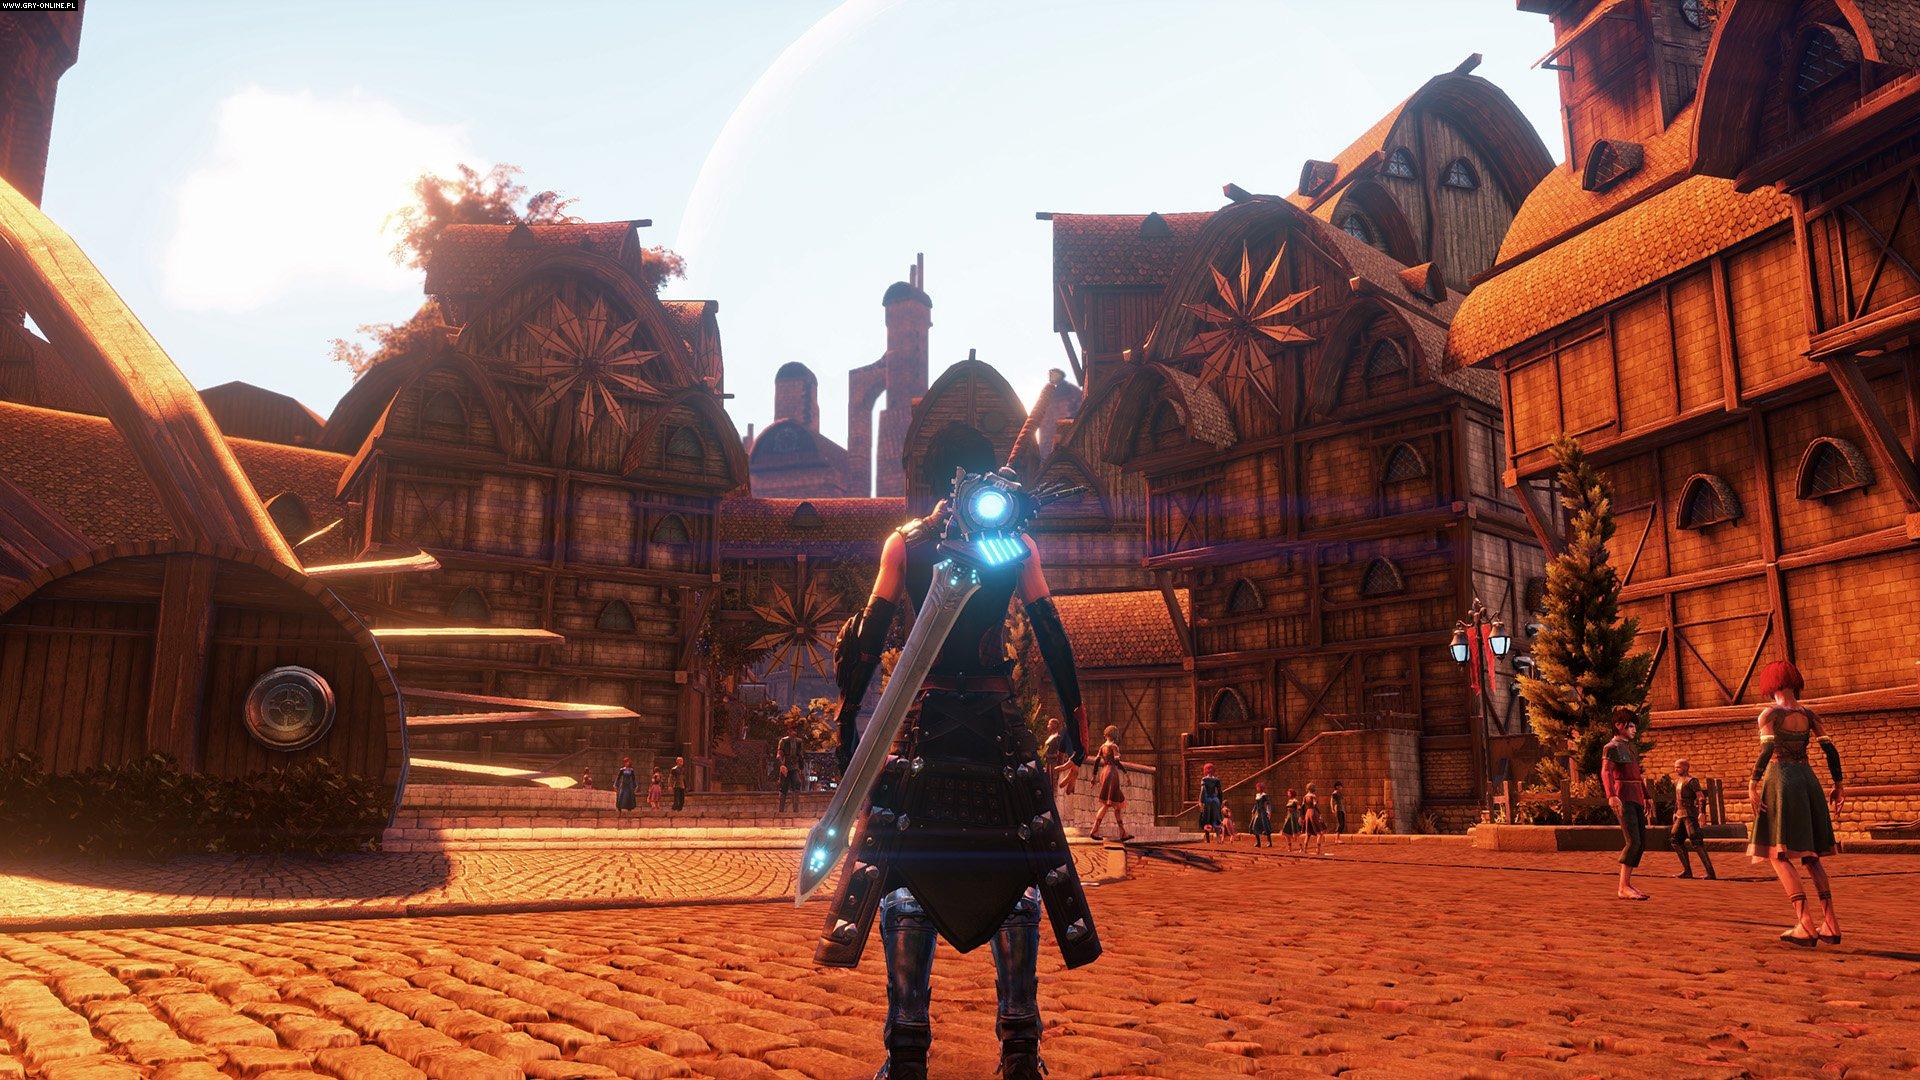 Edge of Eternity PC, PSV, PS4, XONE, WiiU Games Image 5/31, Midgar Studio